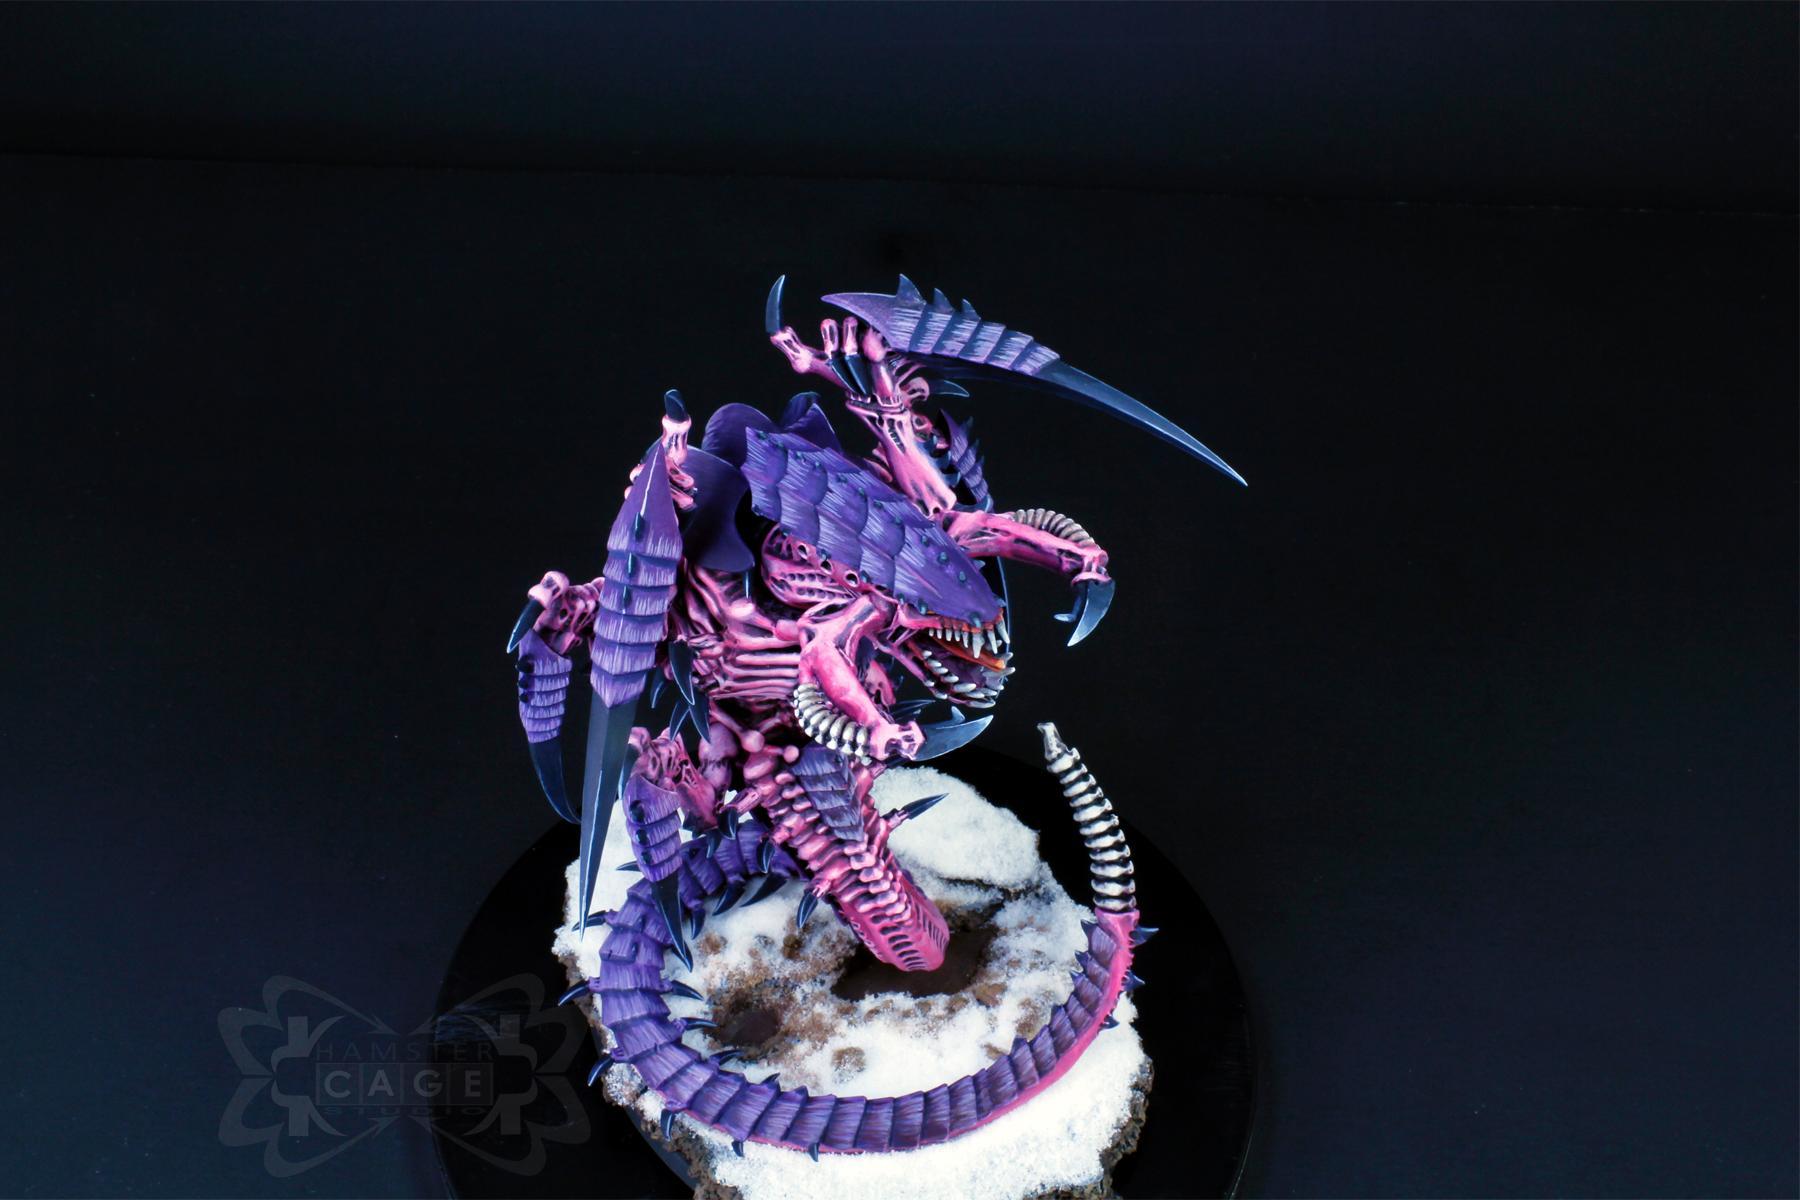 Alien, Trygon, Tyranids